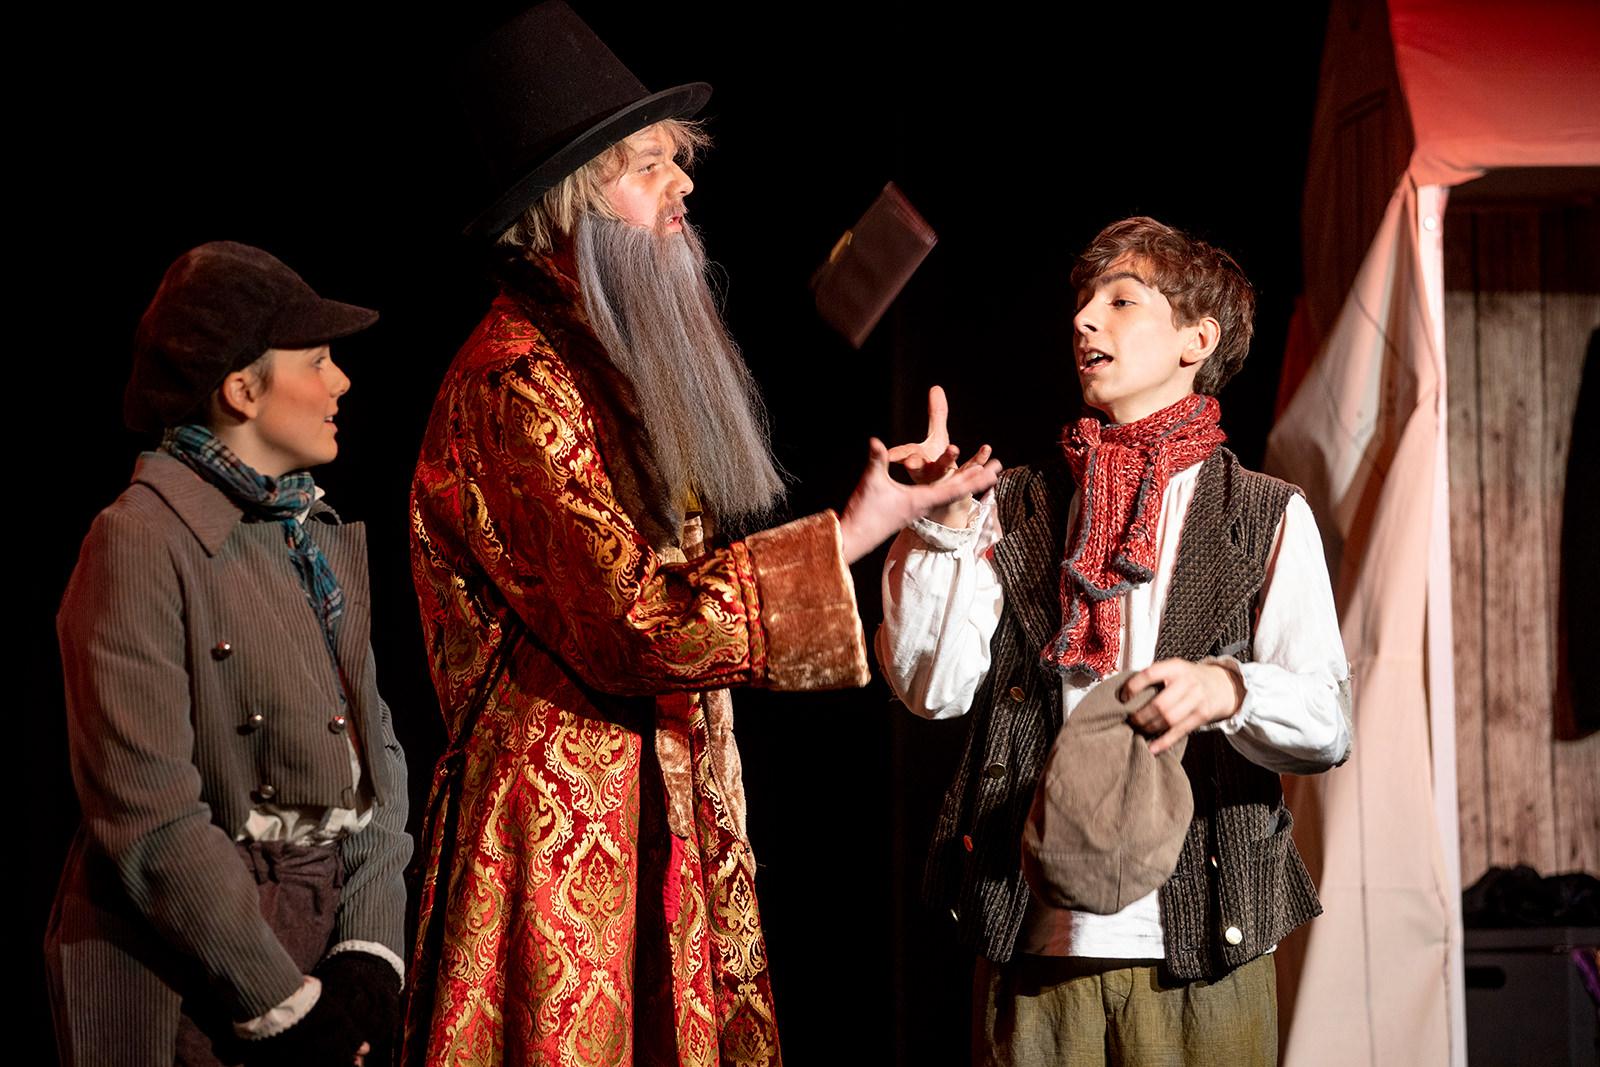 Oliver Twist - Kinderbuchklassiker im theater e.novum in Lüneburg